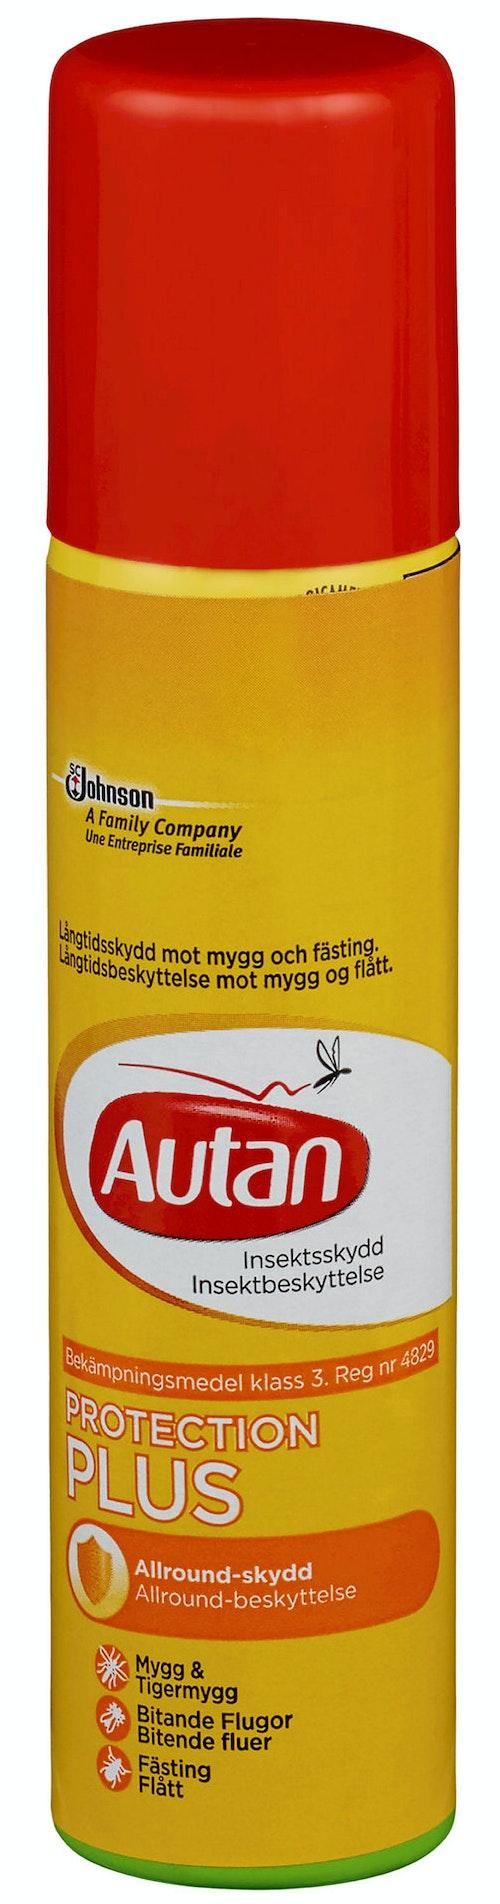 Autan Protection Plus Aerosol Insektbeskyttelse, 0,1 l